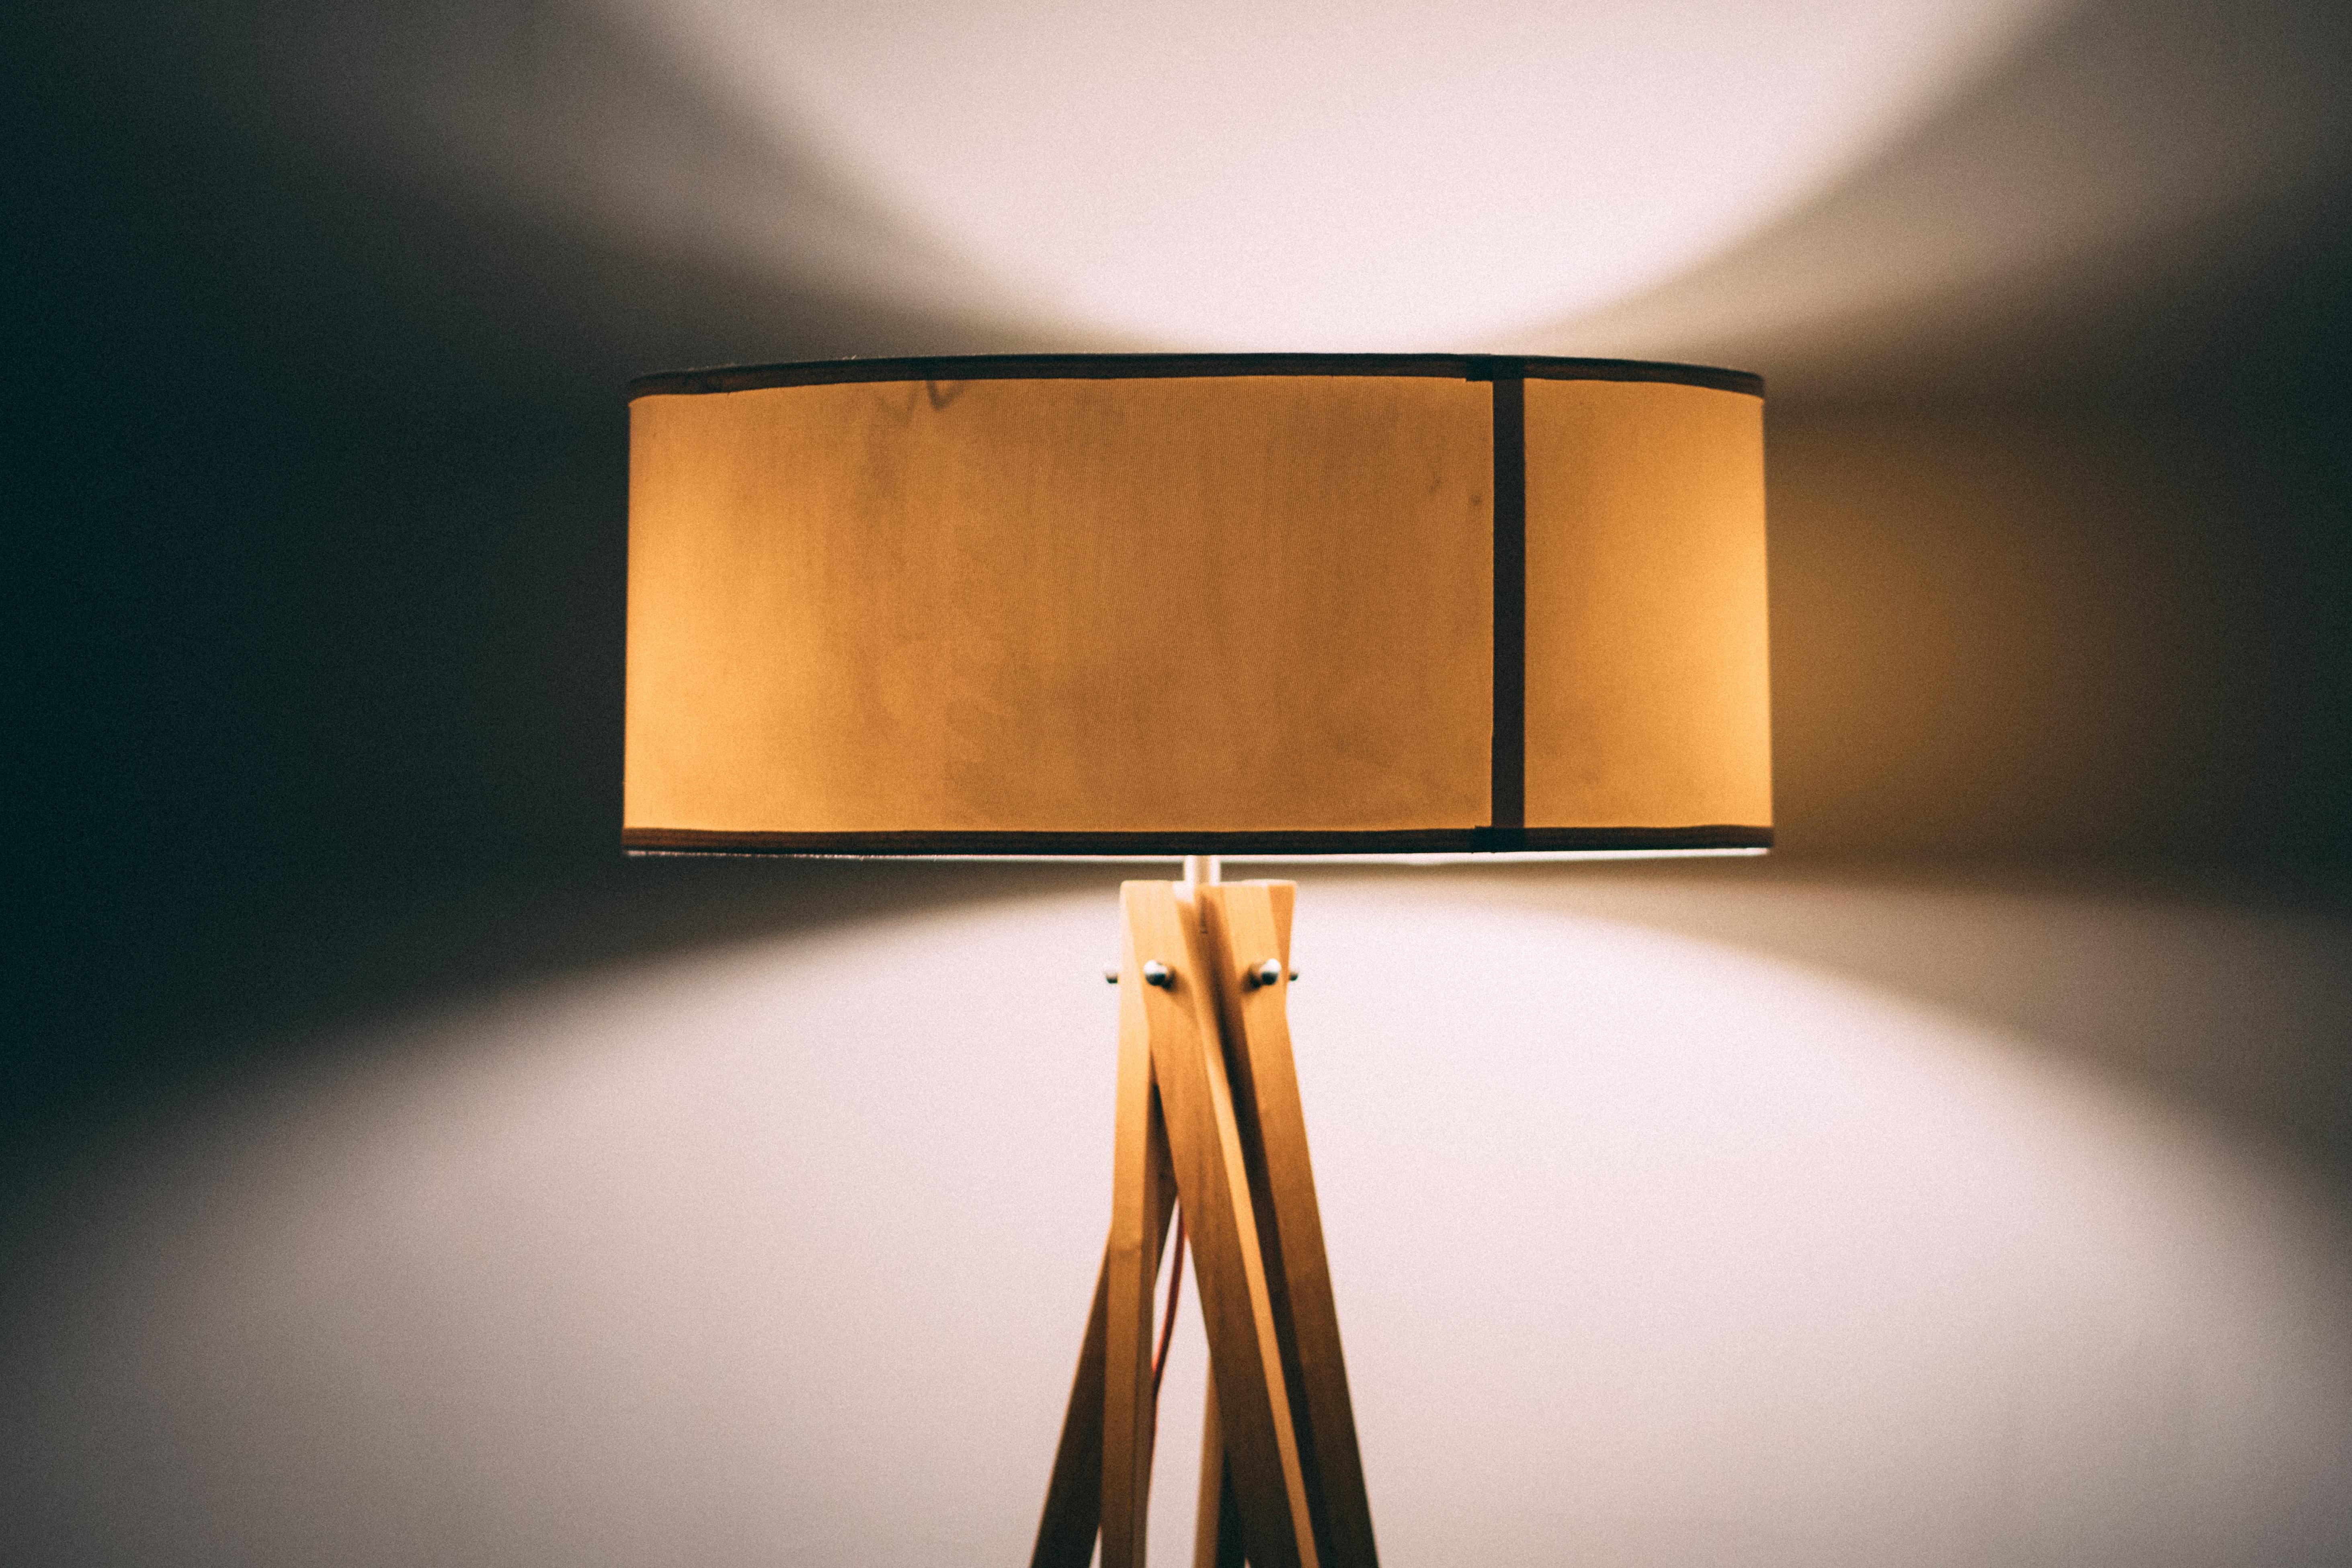 brown wooden tripod lamp